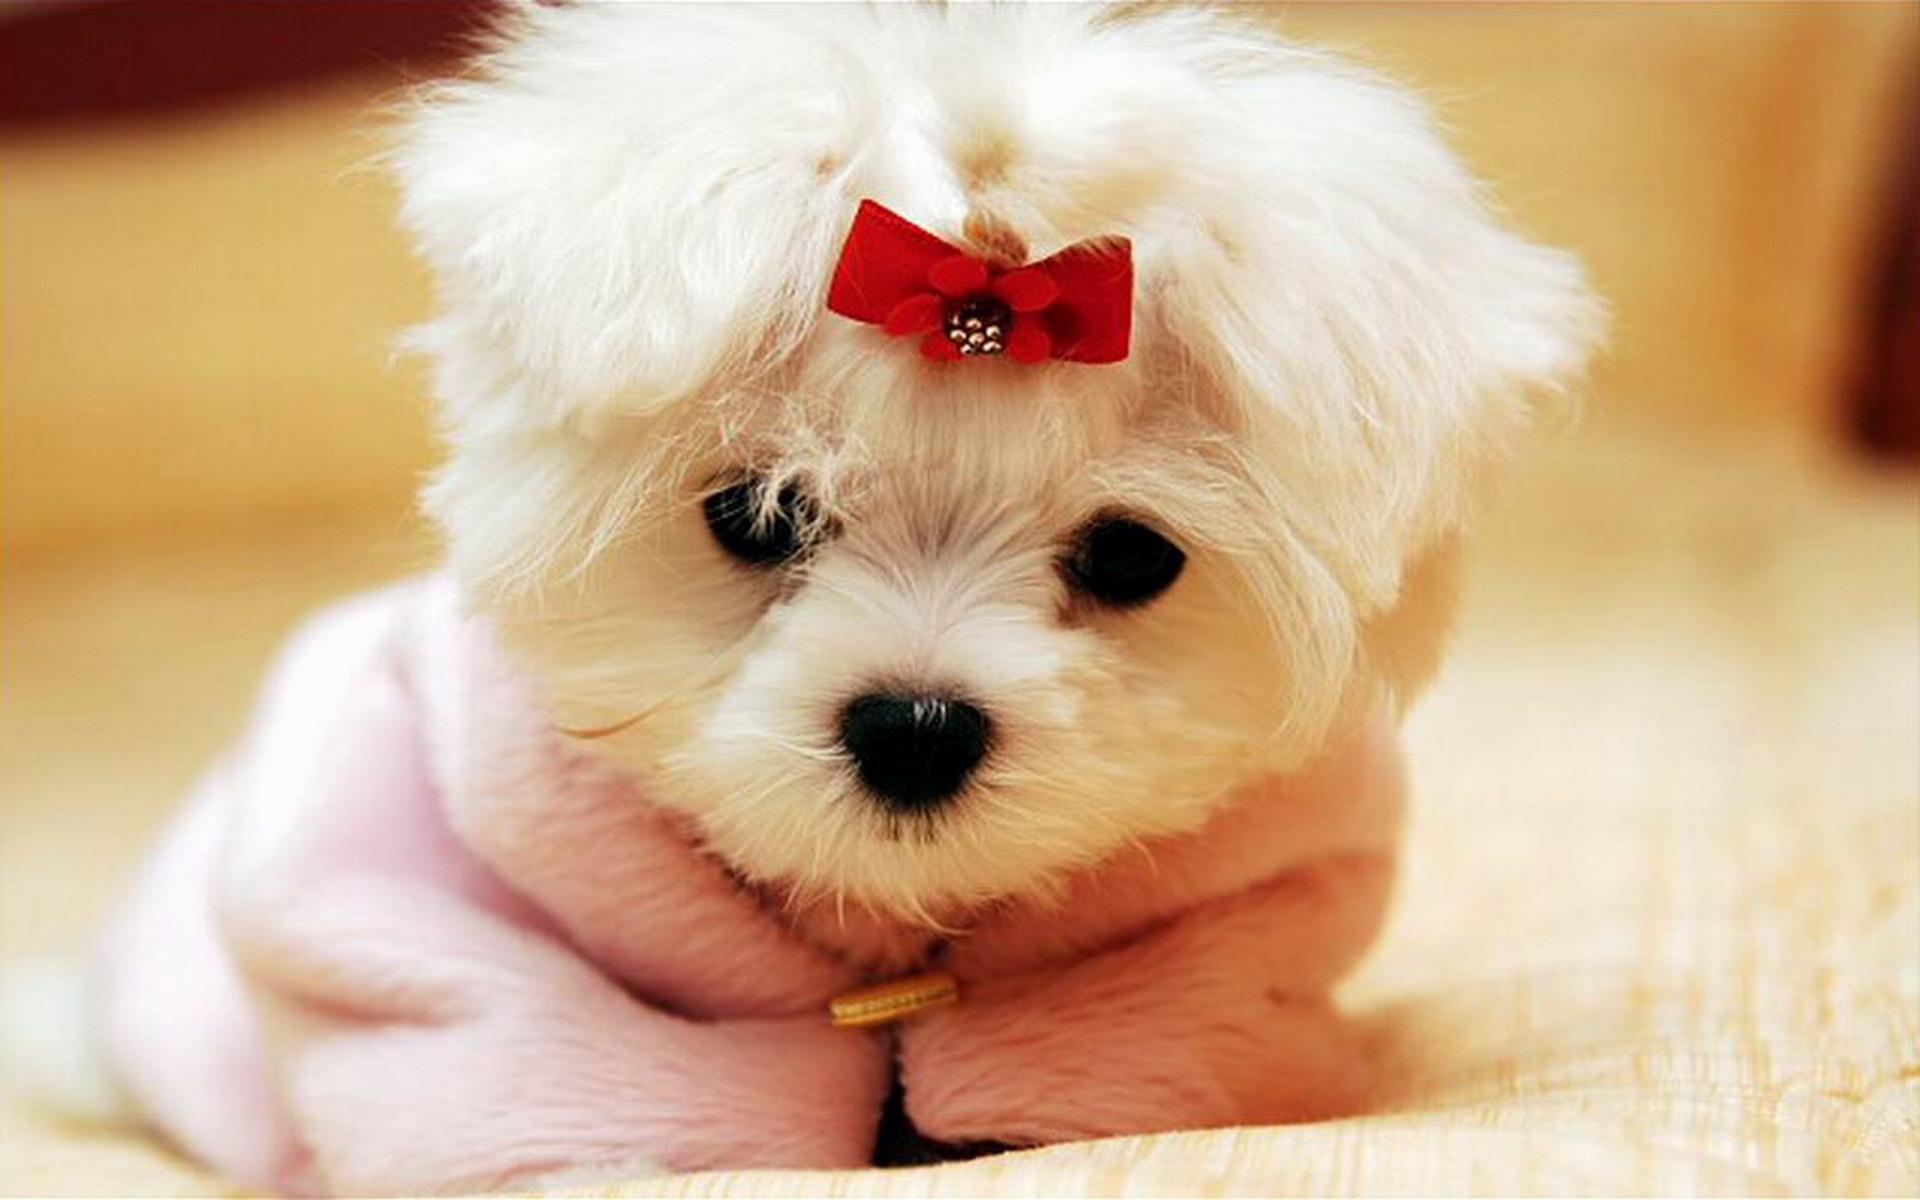 ... Cute-Dog-With-Ribbon-HD-Wallpaper-13605-Wallpaper ...